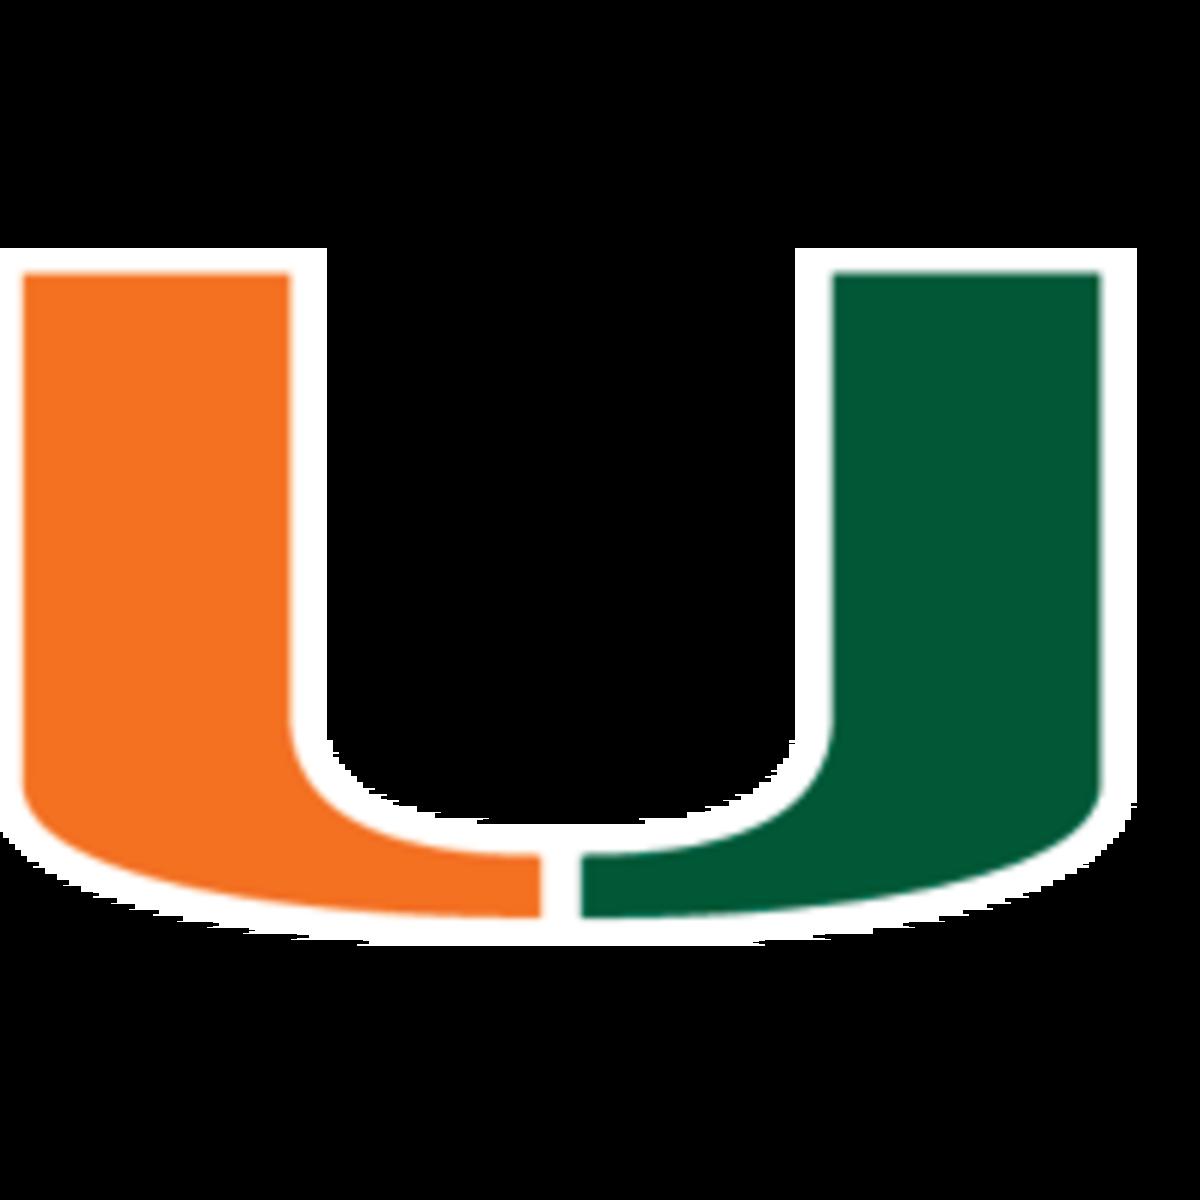 College Football Top 25 Rankings: Miami